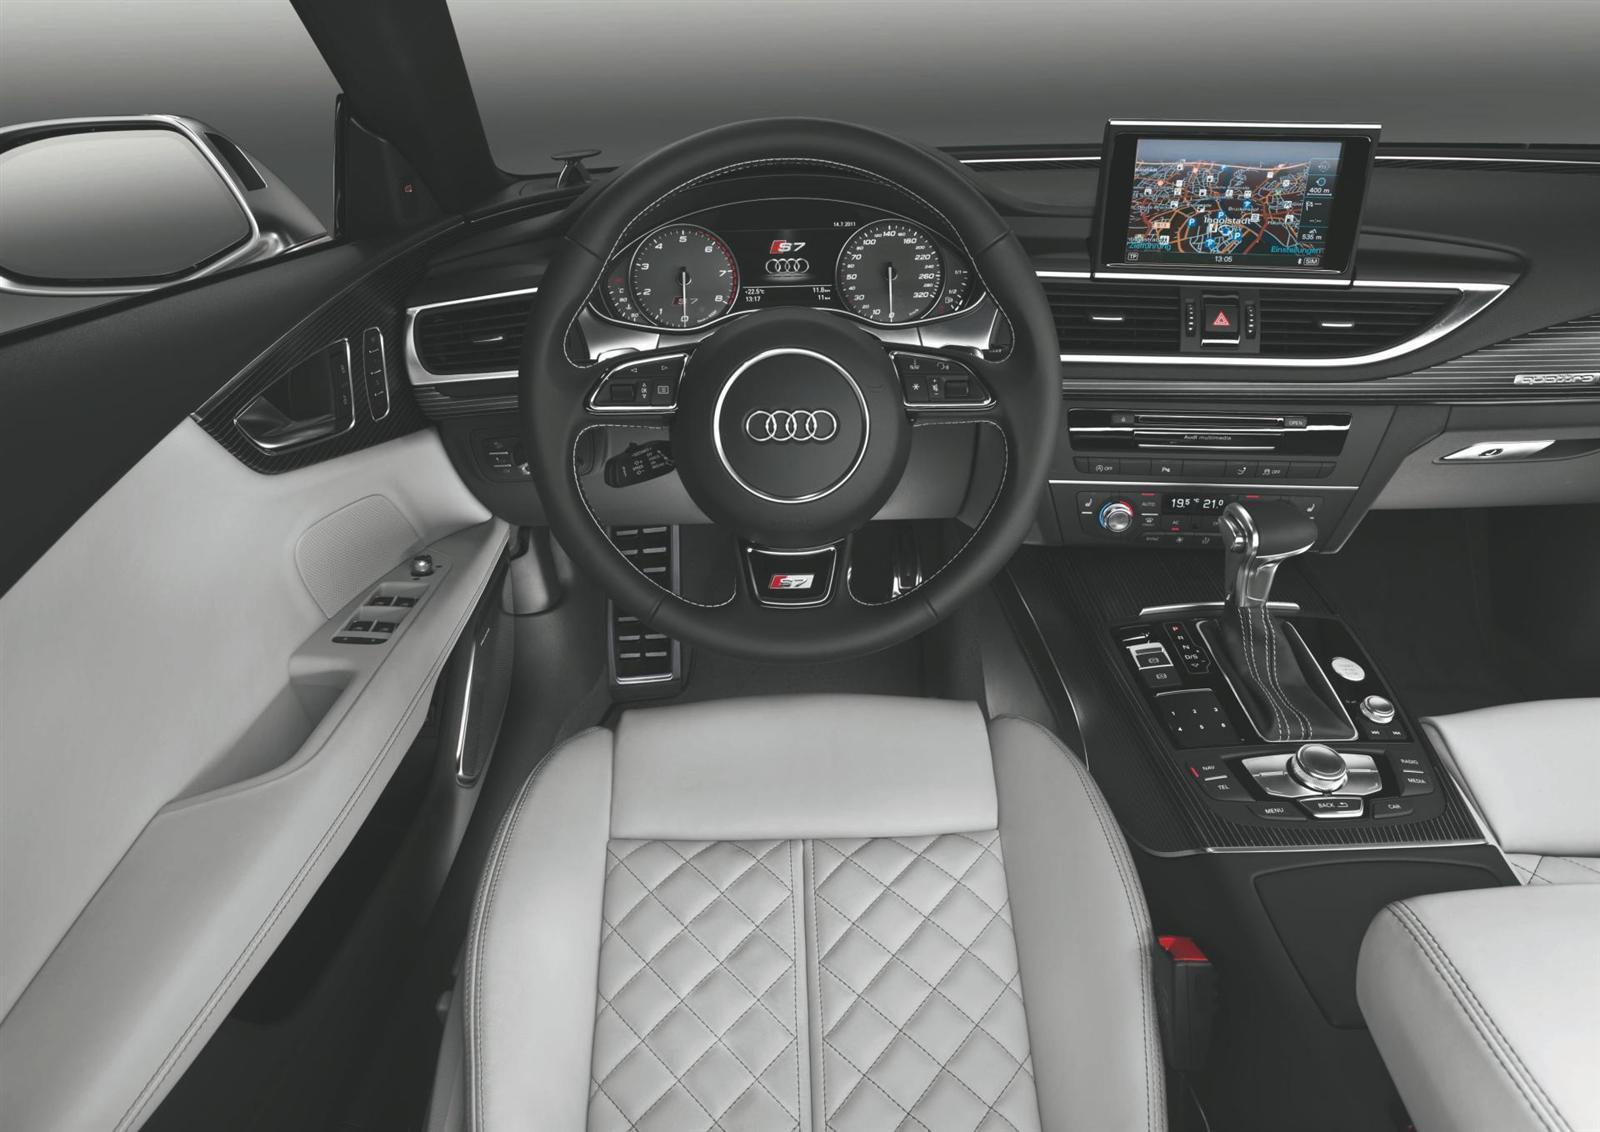 2012 Audi S7 Sportback